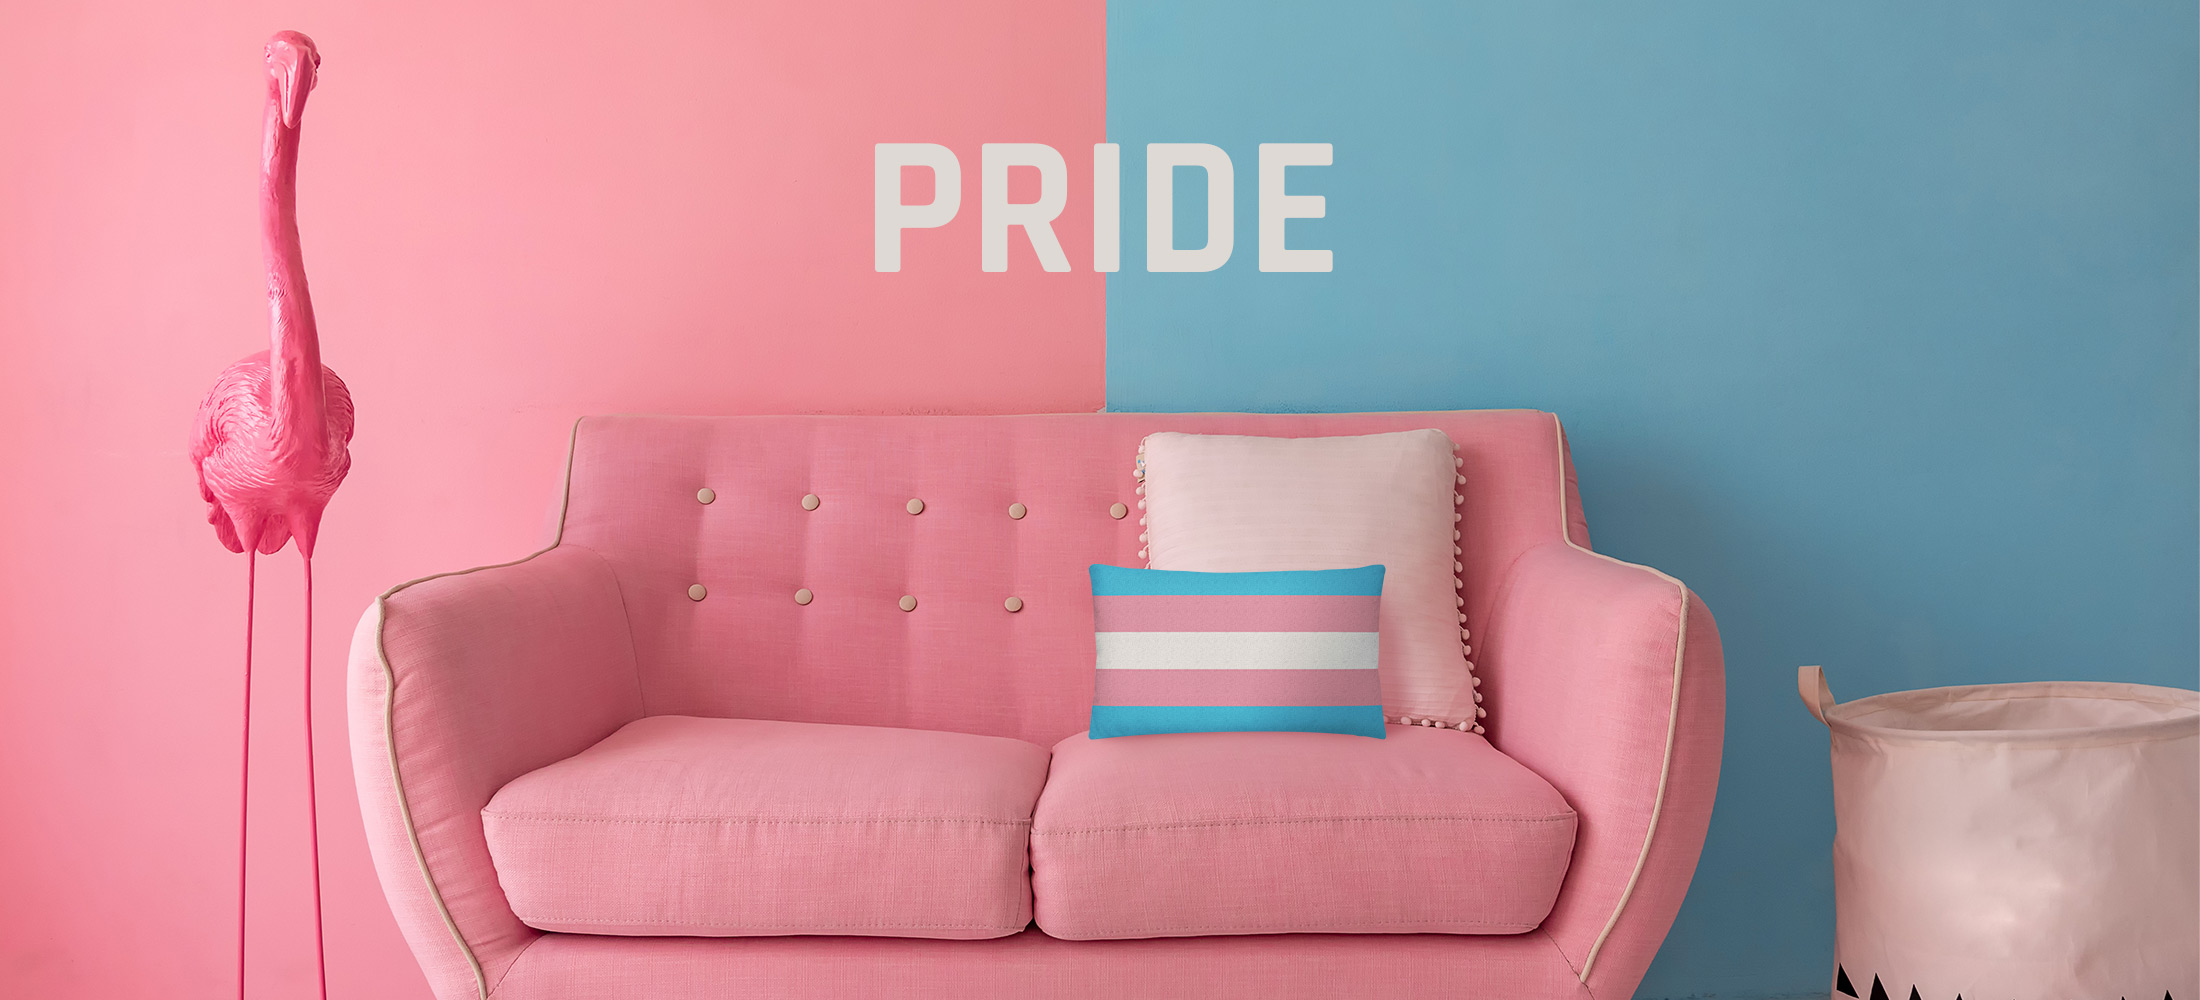 Pride trans kuddar startsidan Kunskapat